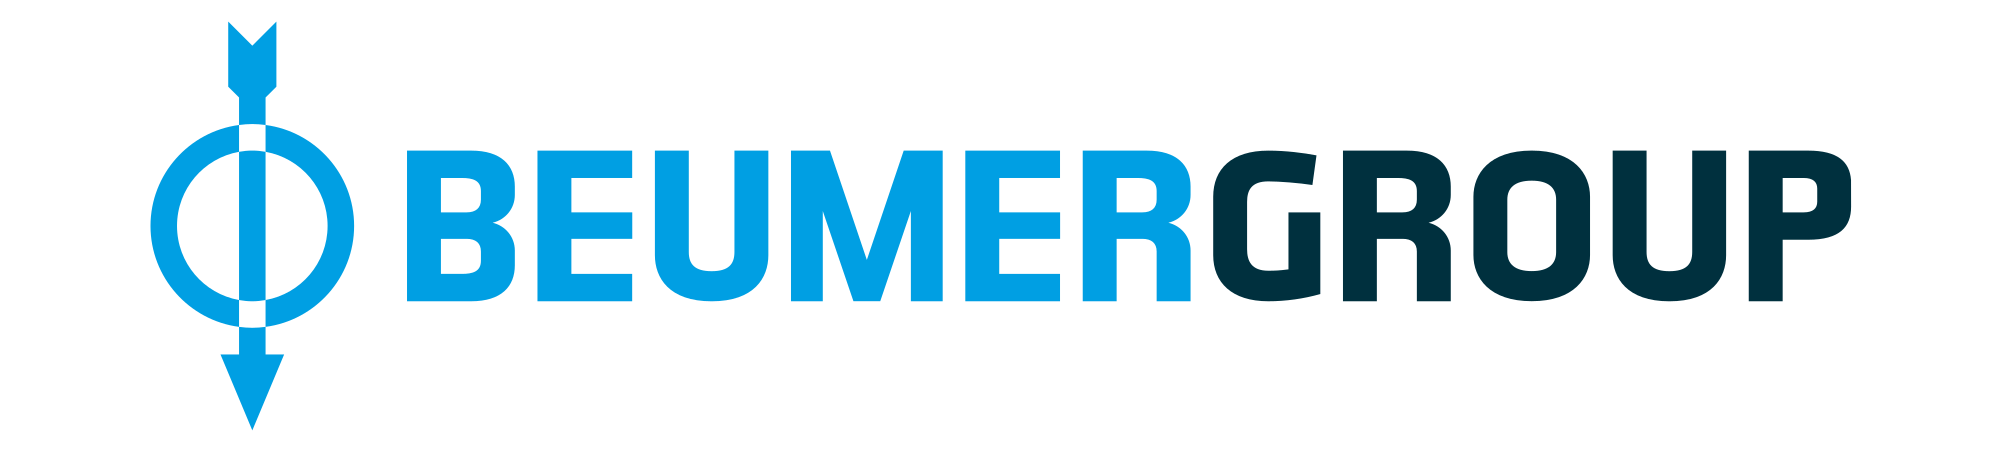 BEUMER Group A/S logo